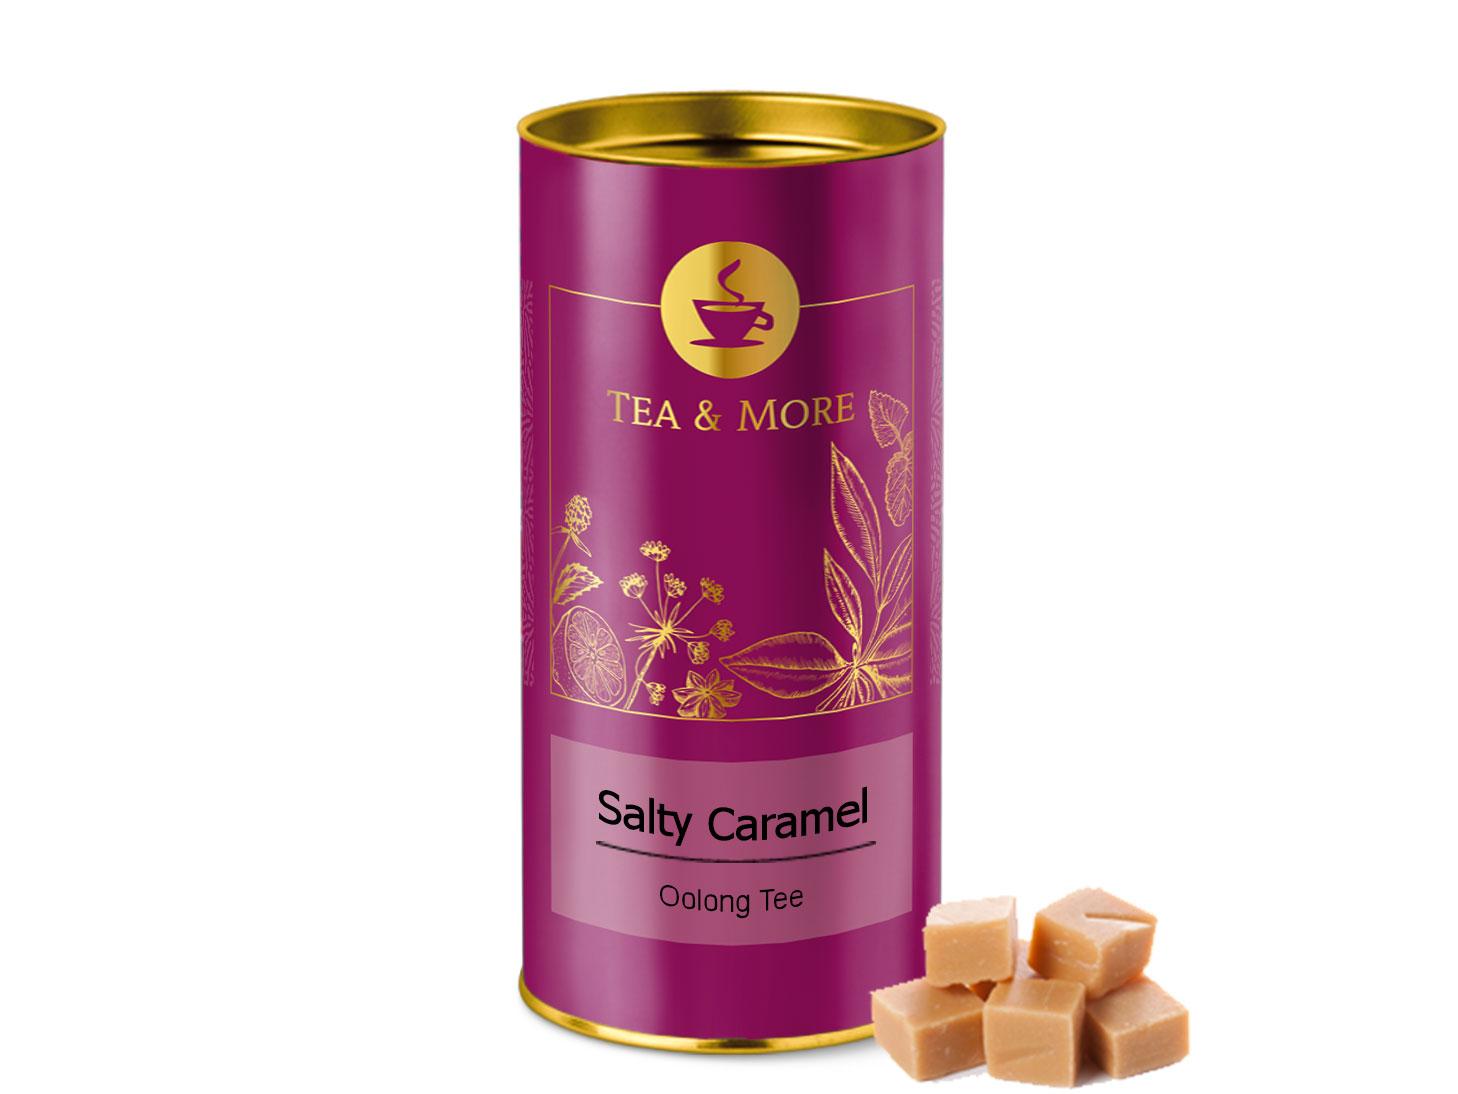 Oolong Salty Caramel